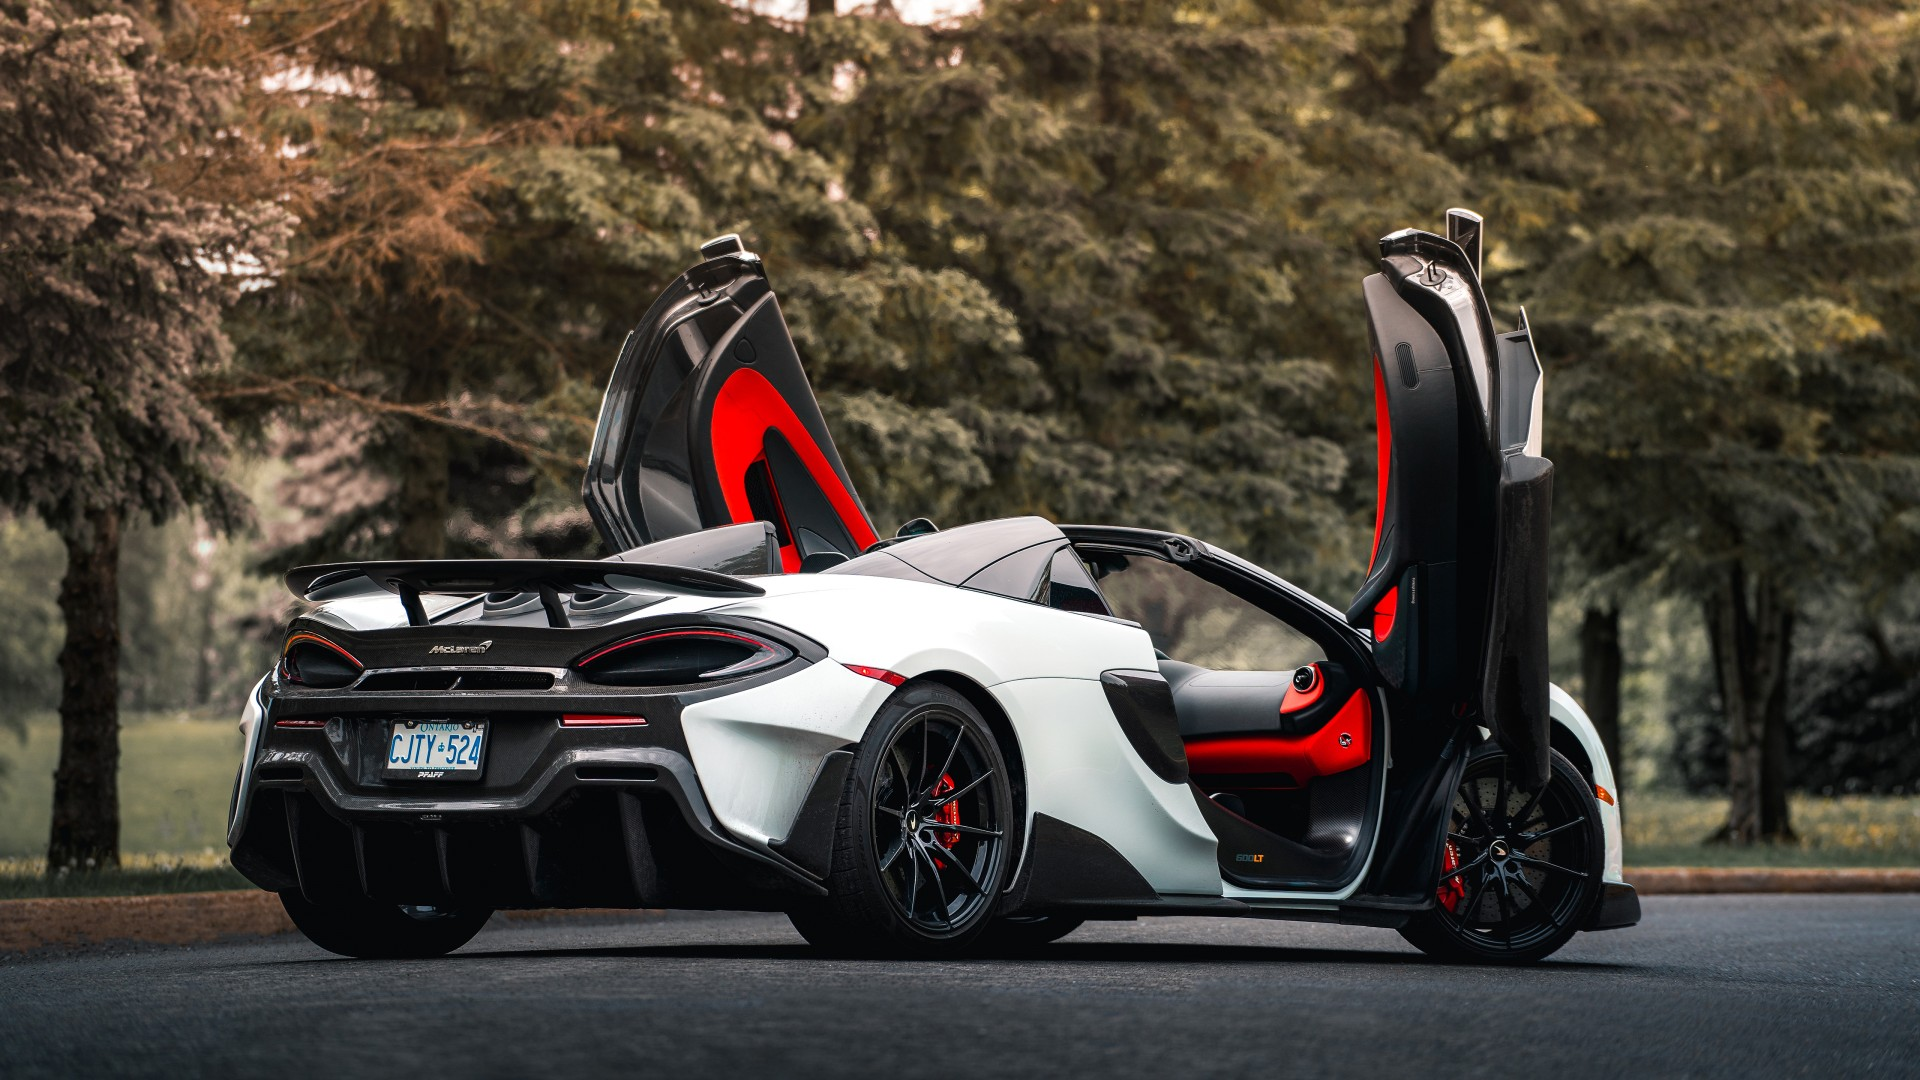 2020 Mclaren 600lt Spider 4k 2 Wallpaper Hd Car